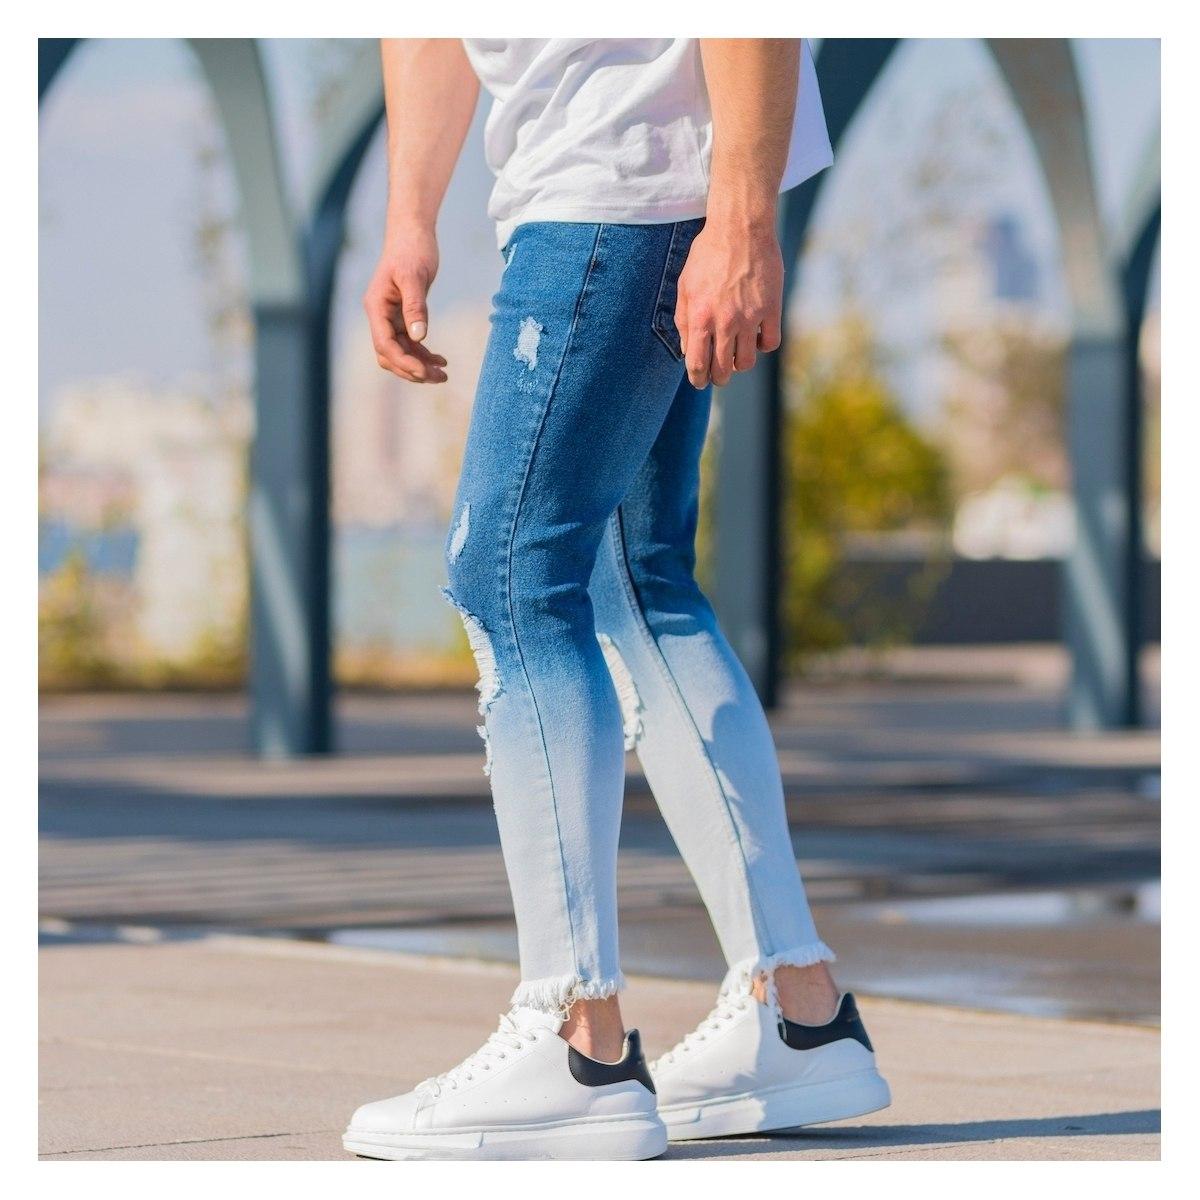 Men's Ragged Degrade Jeans...